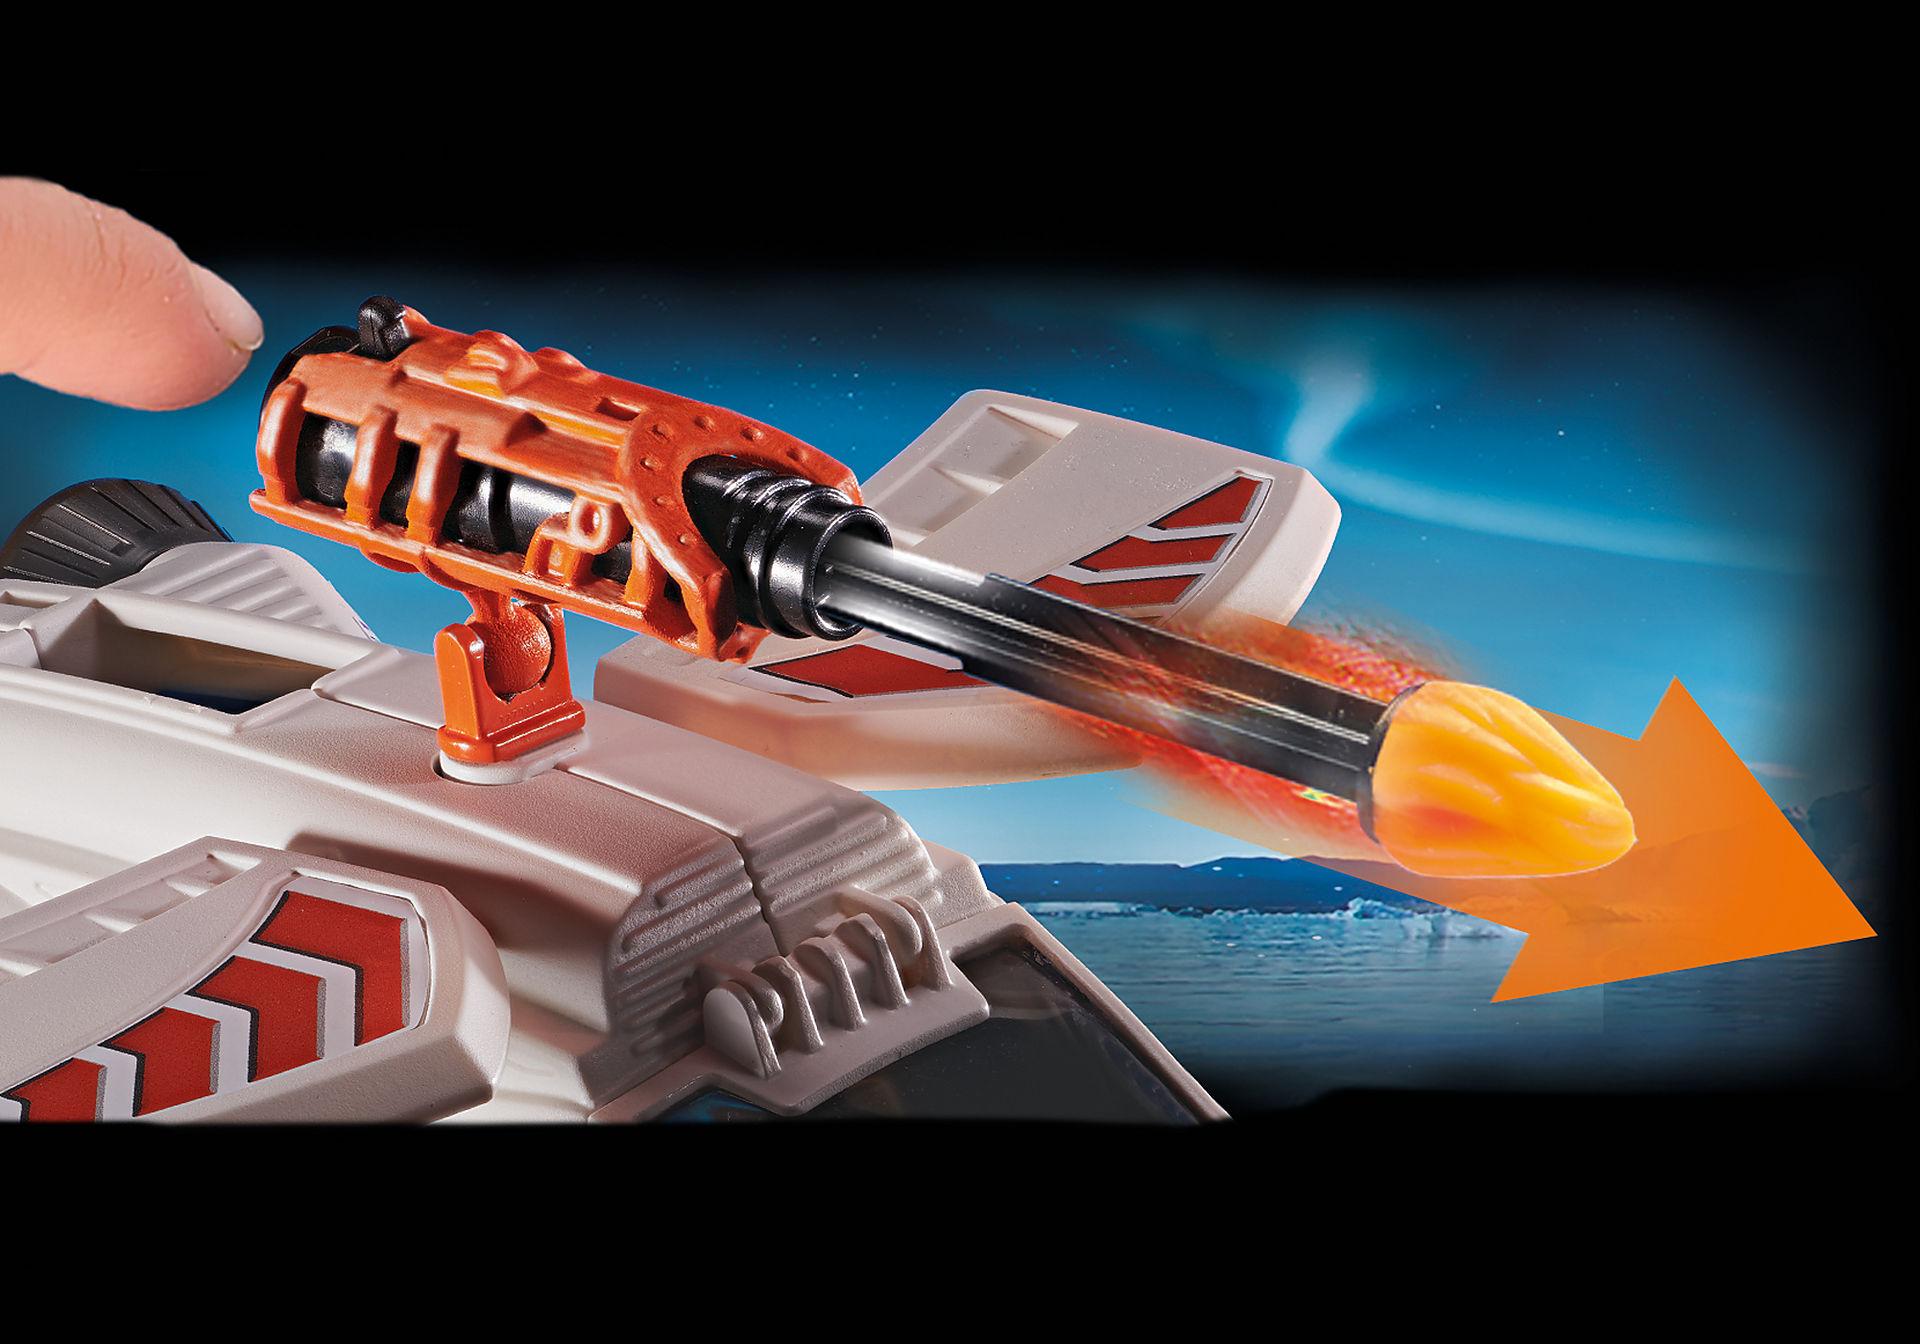 70231 Spy Team Planeador de Nieve zoom image6